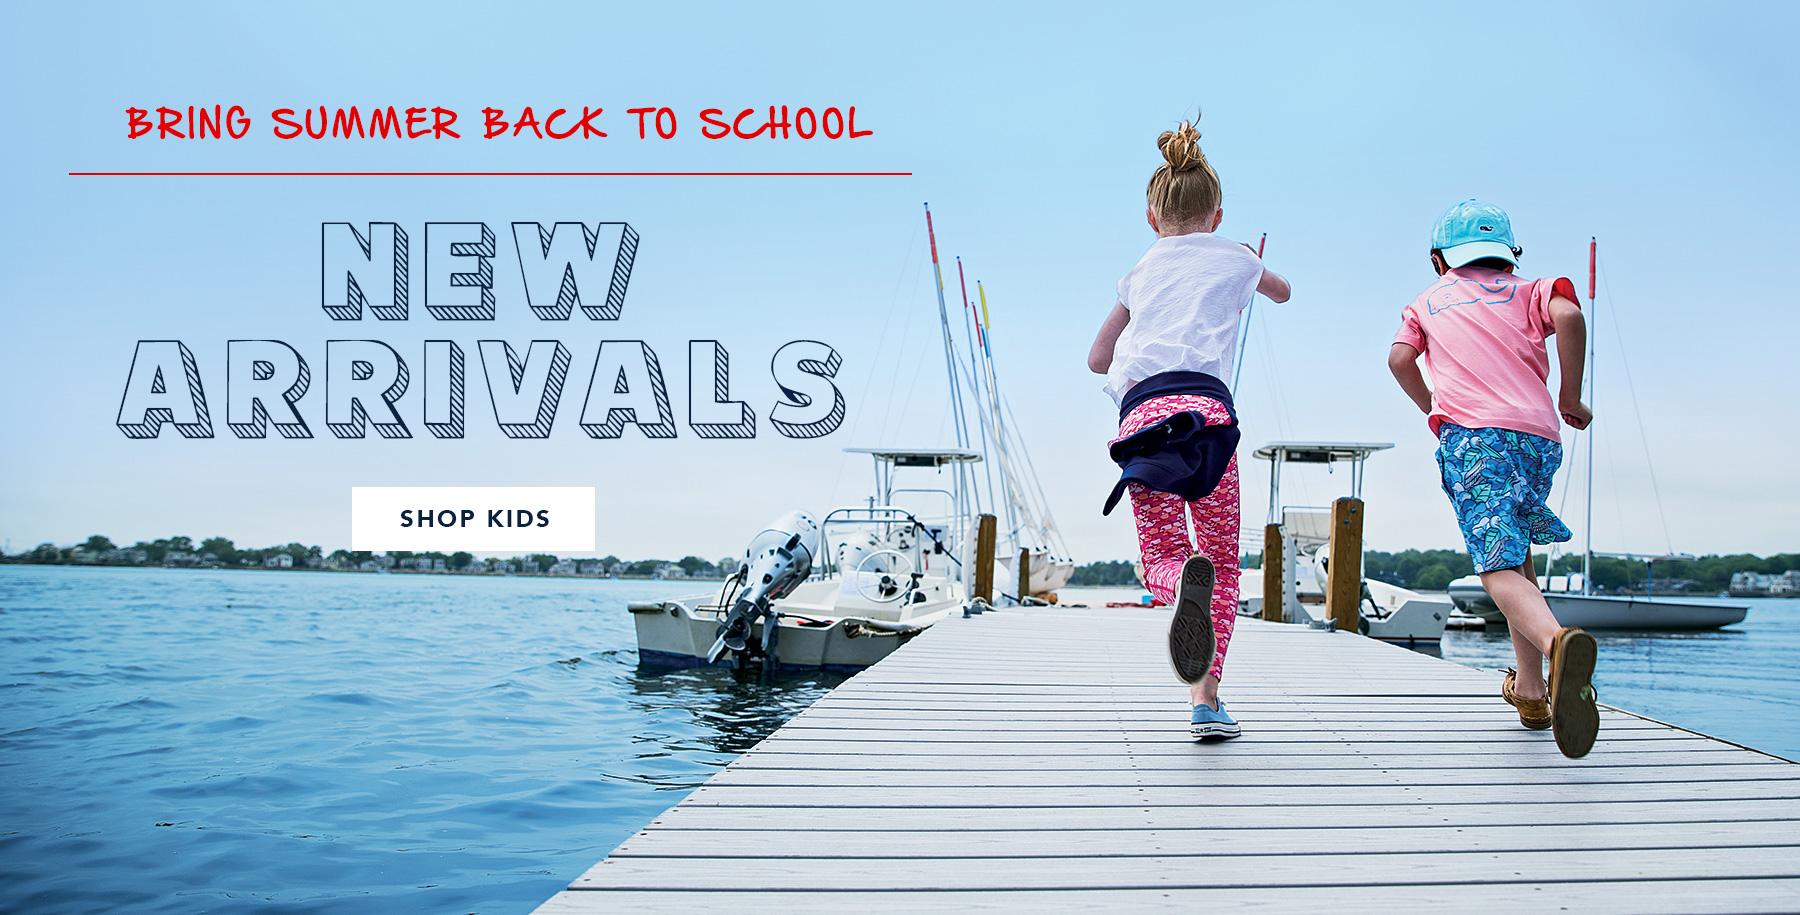 Bring Summer back to school. New Arrivals. Shop Kids.